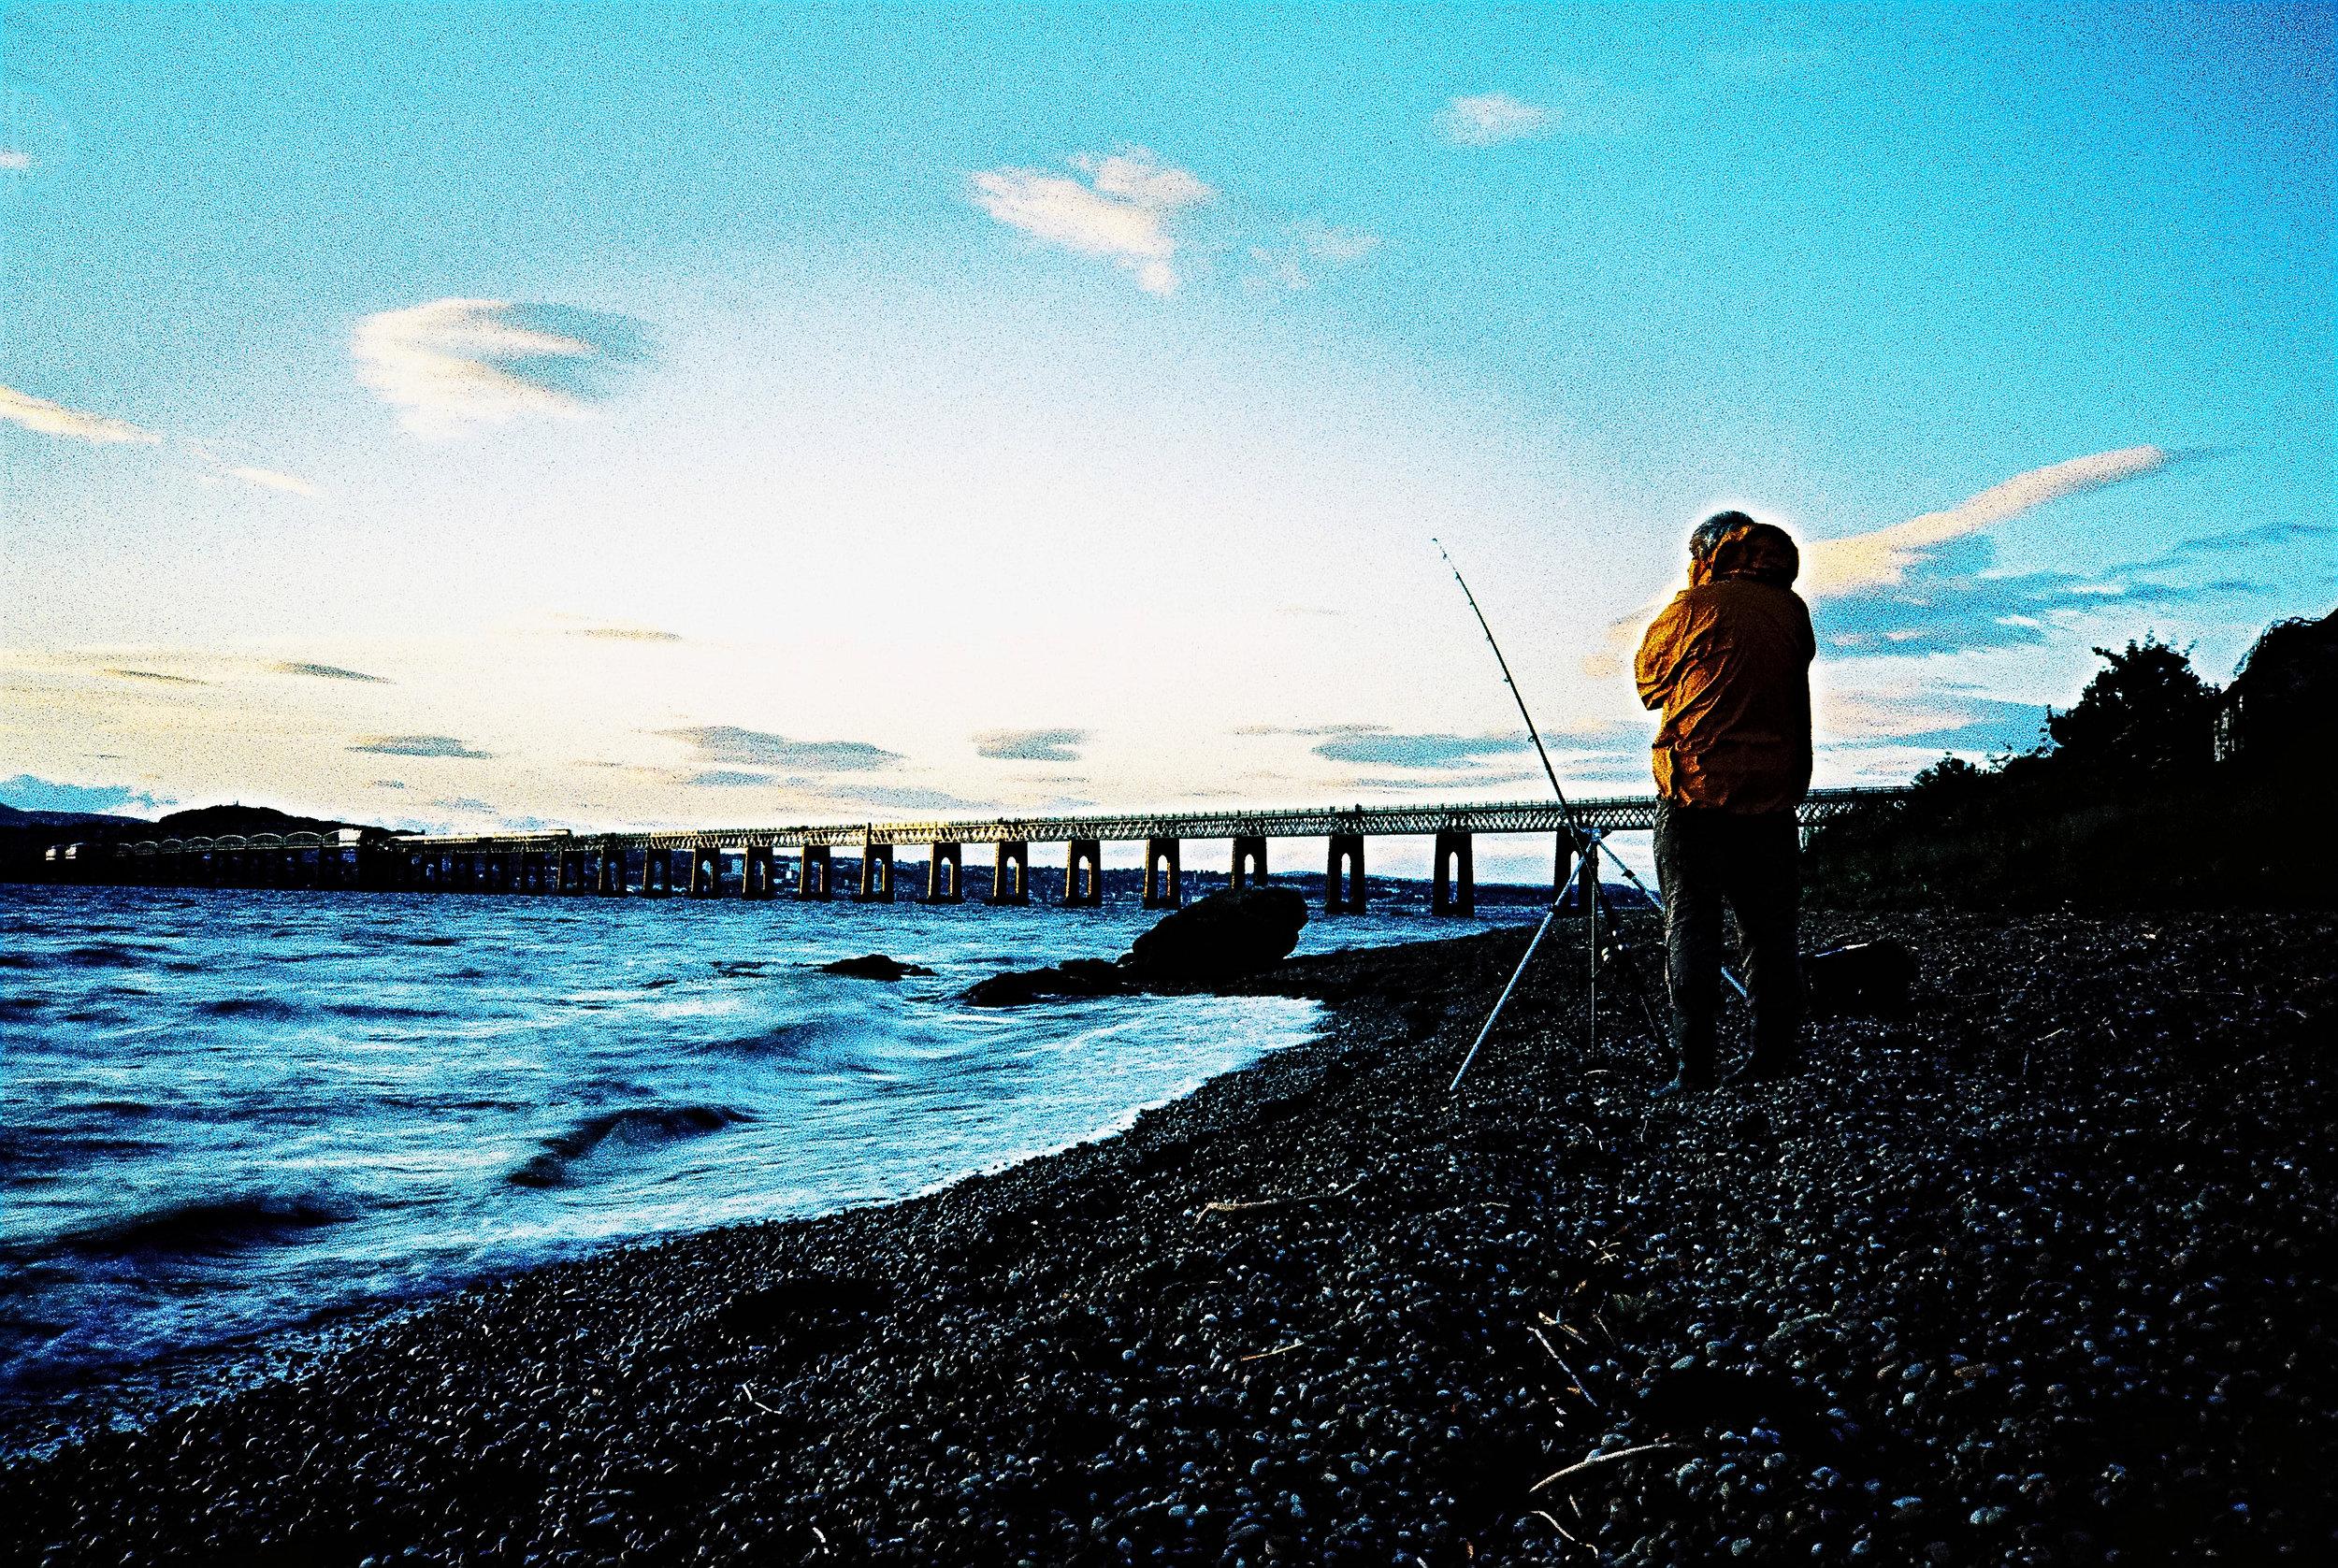 X-pro Fishing | Olympus XA | Velvia 50 | Michael Rennie